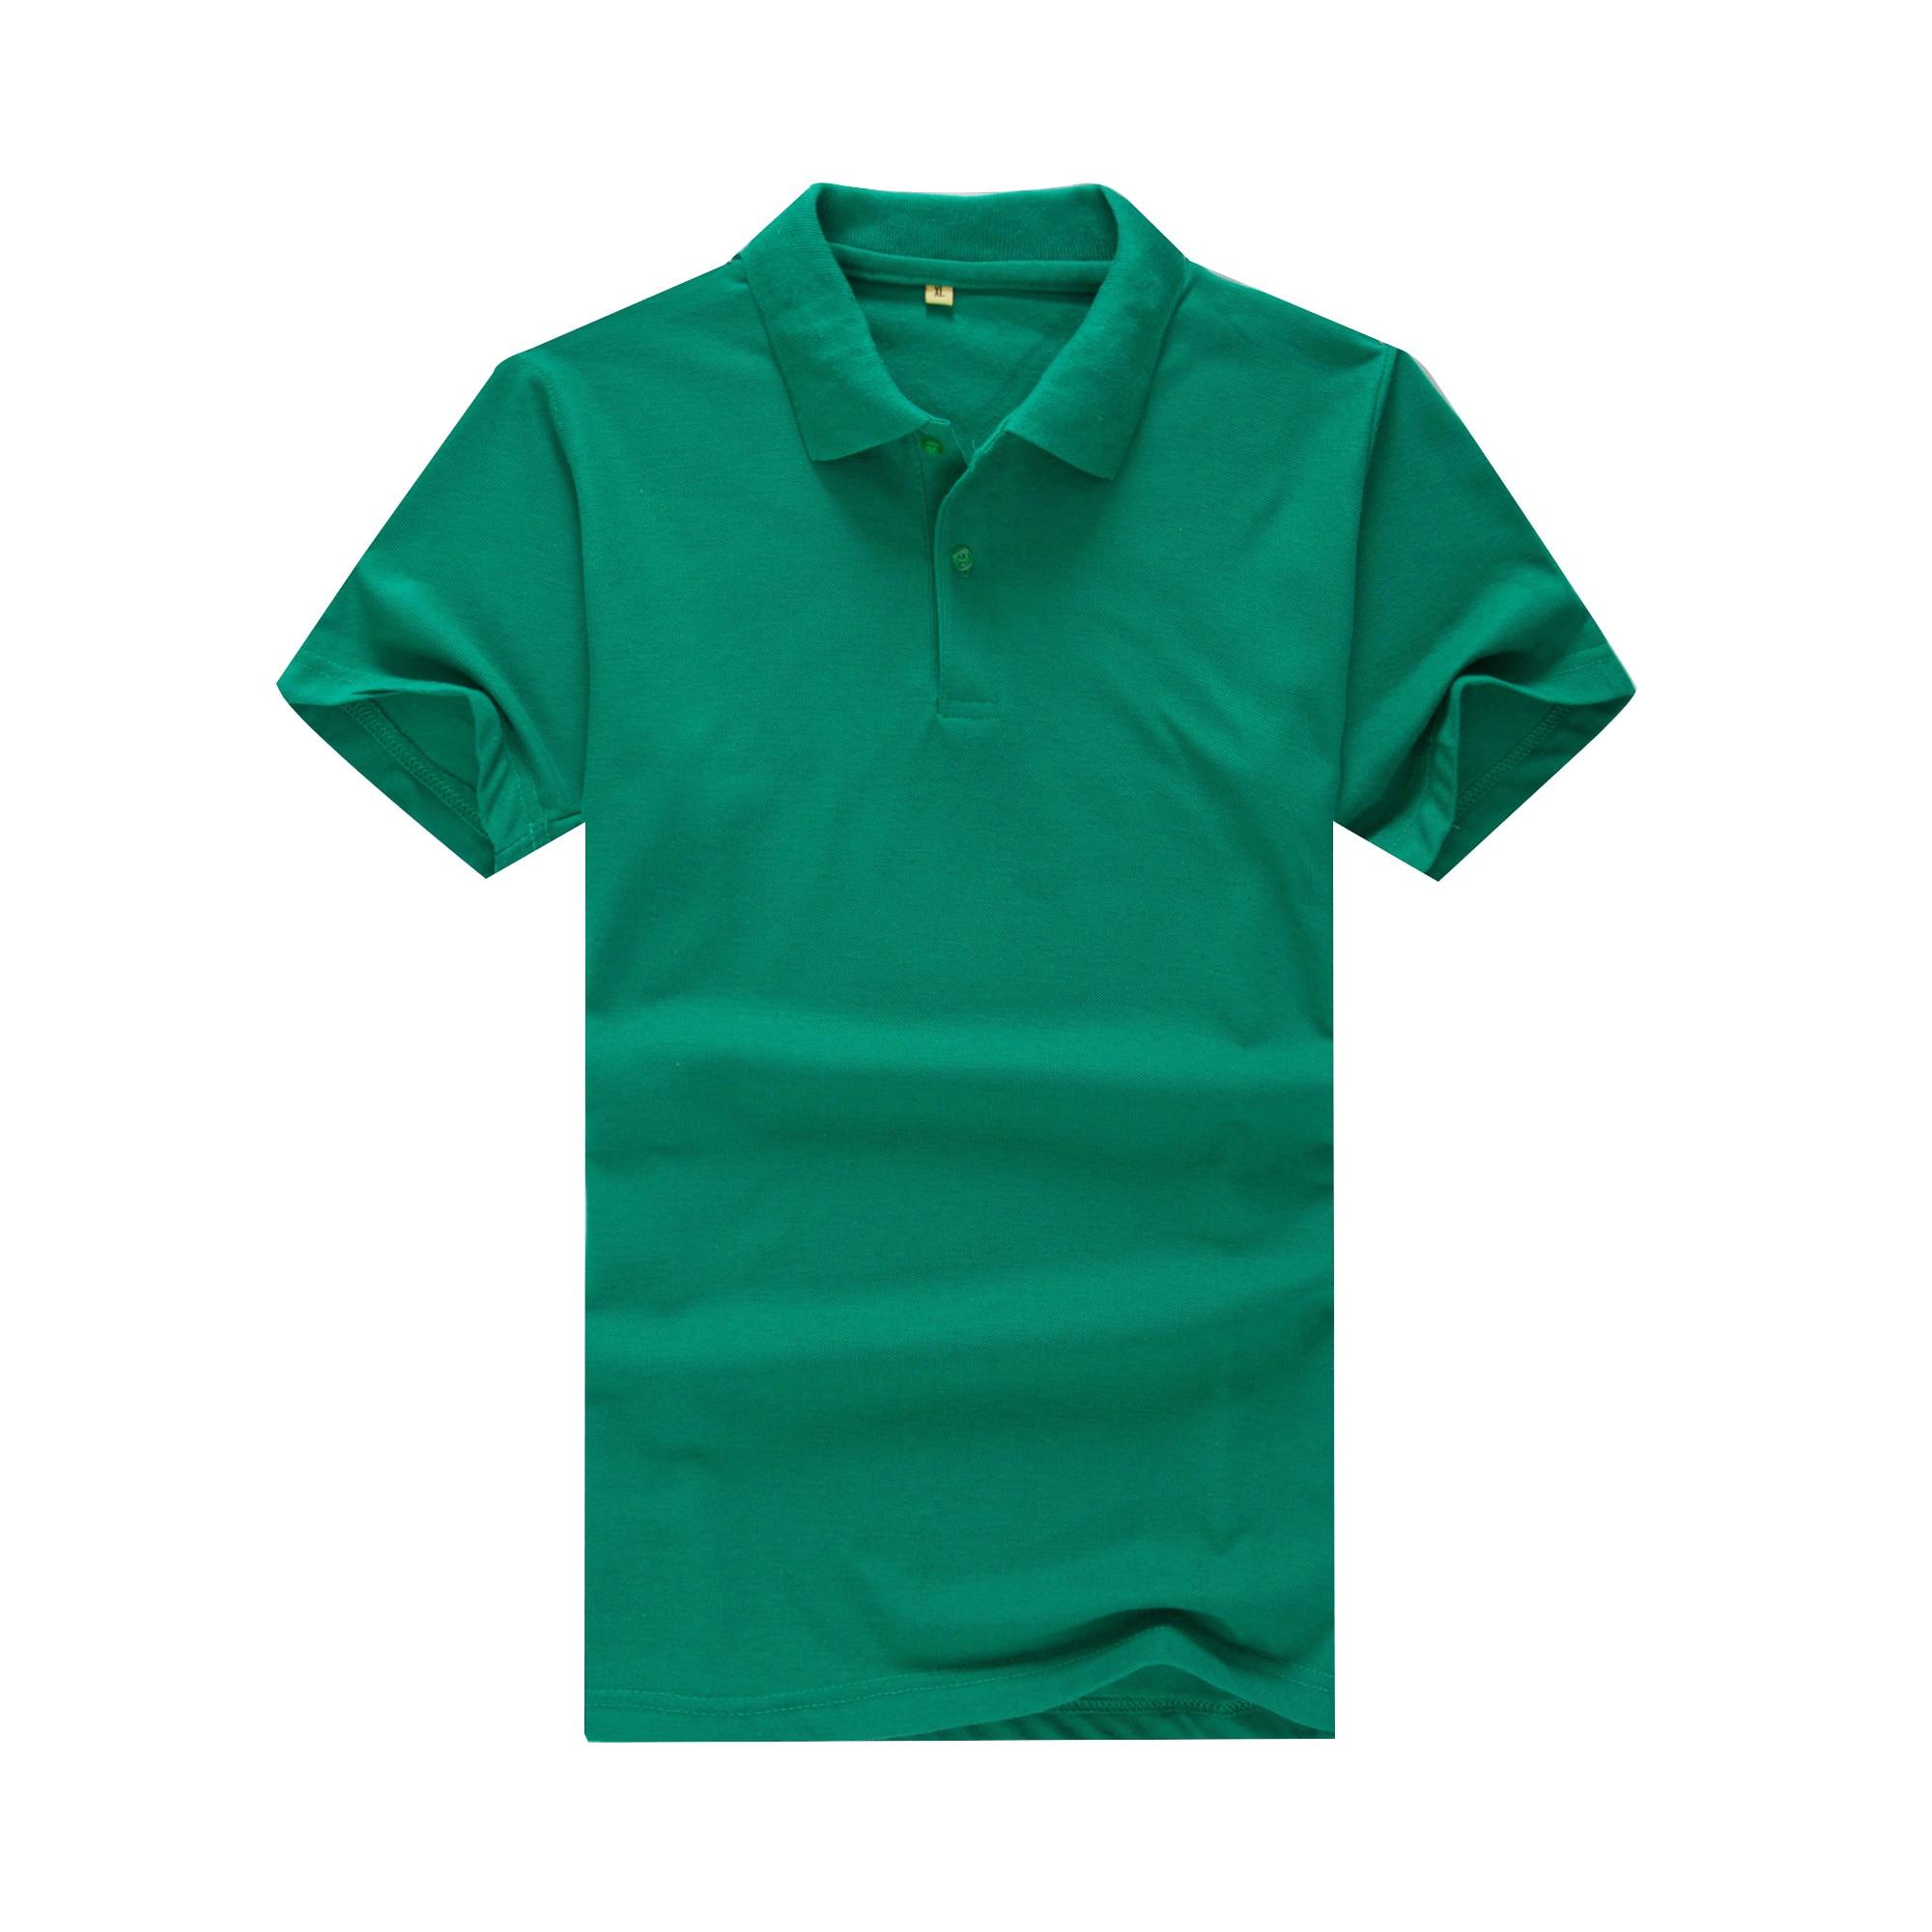 2020 new Popular Personalized Customize men polo shirt short sleeve advertising shirt A330 fashionable